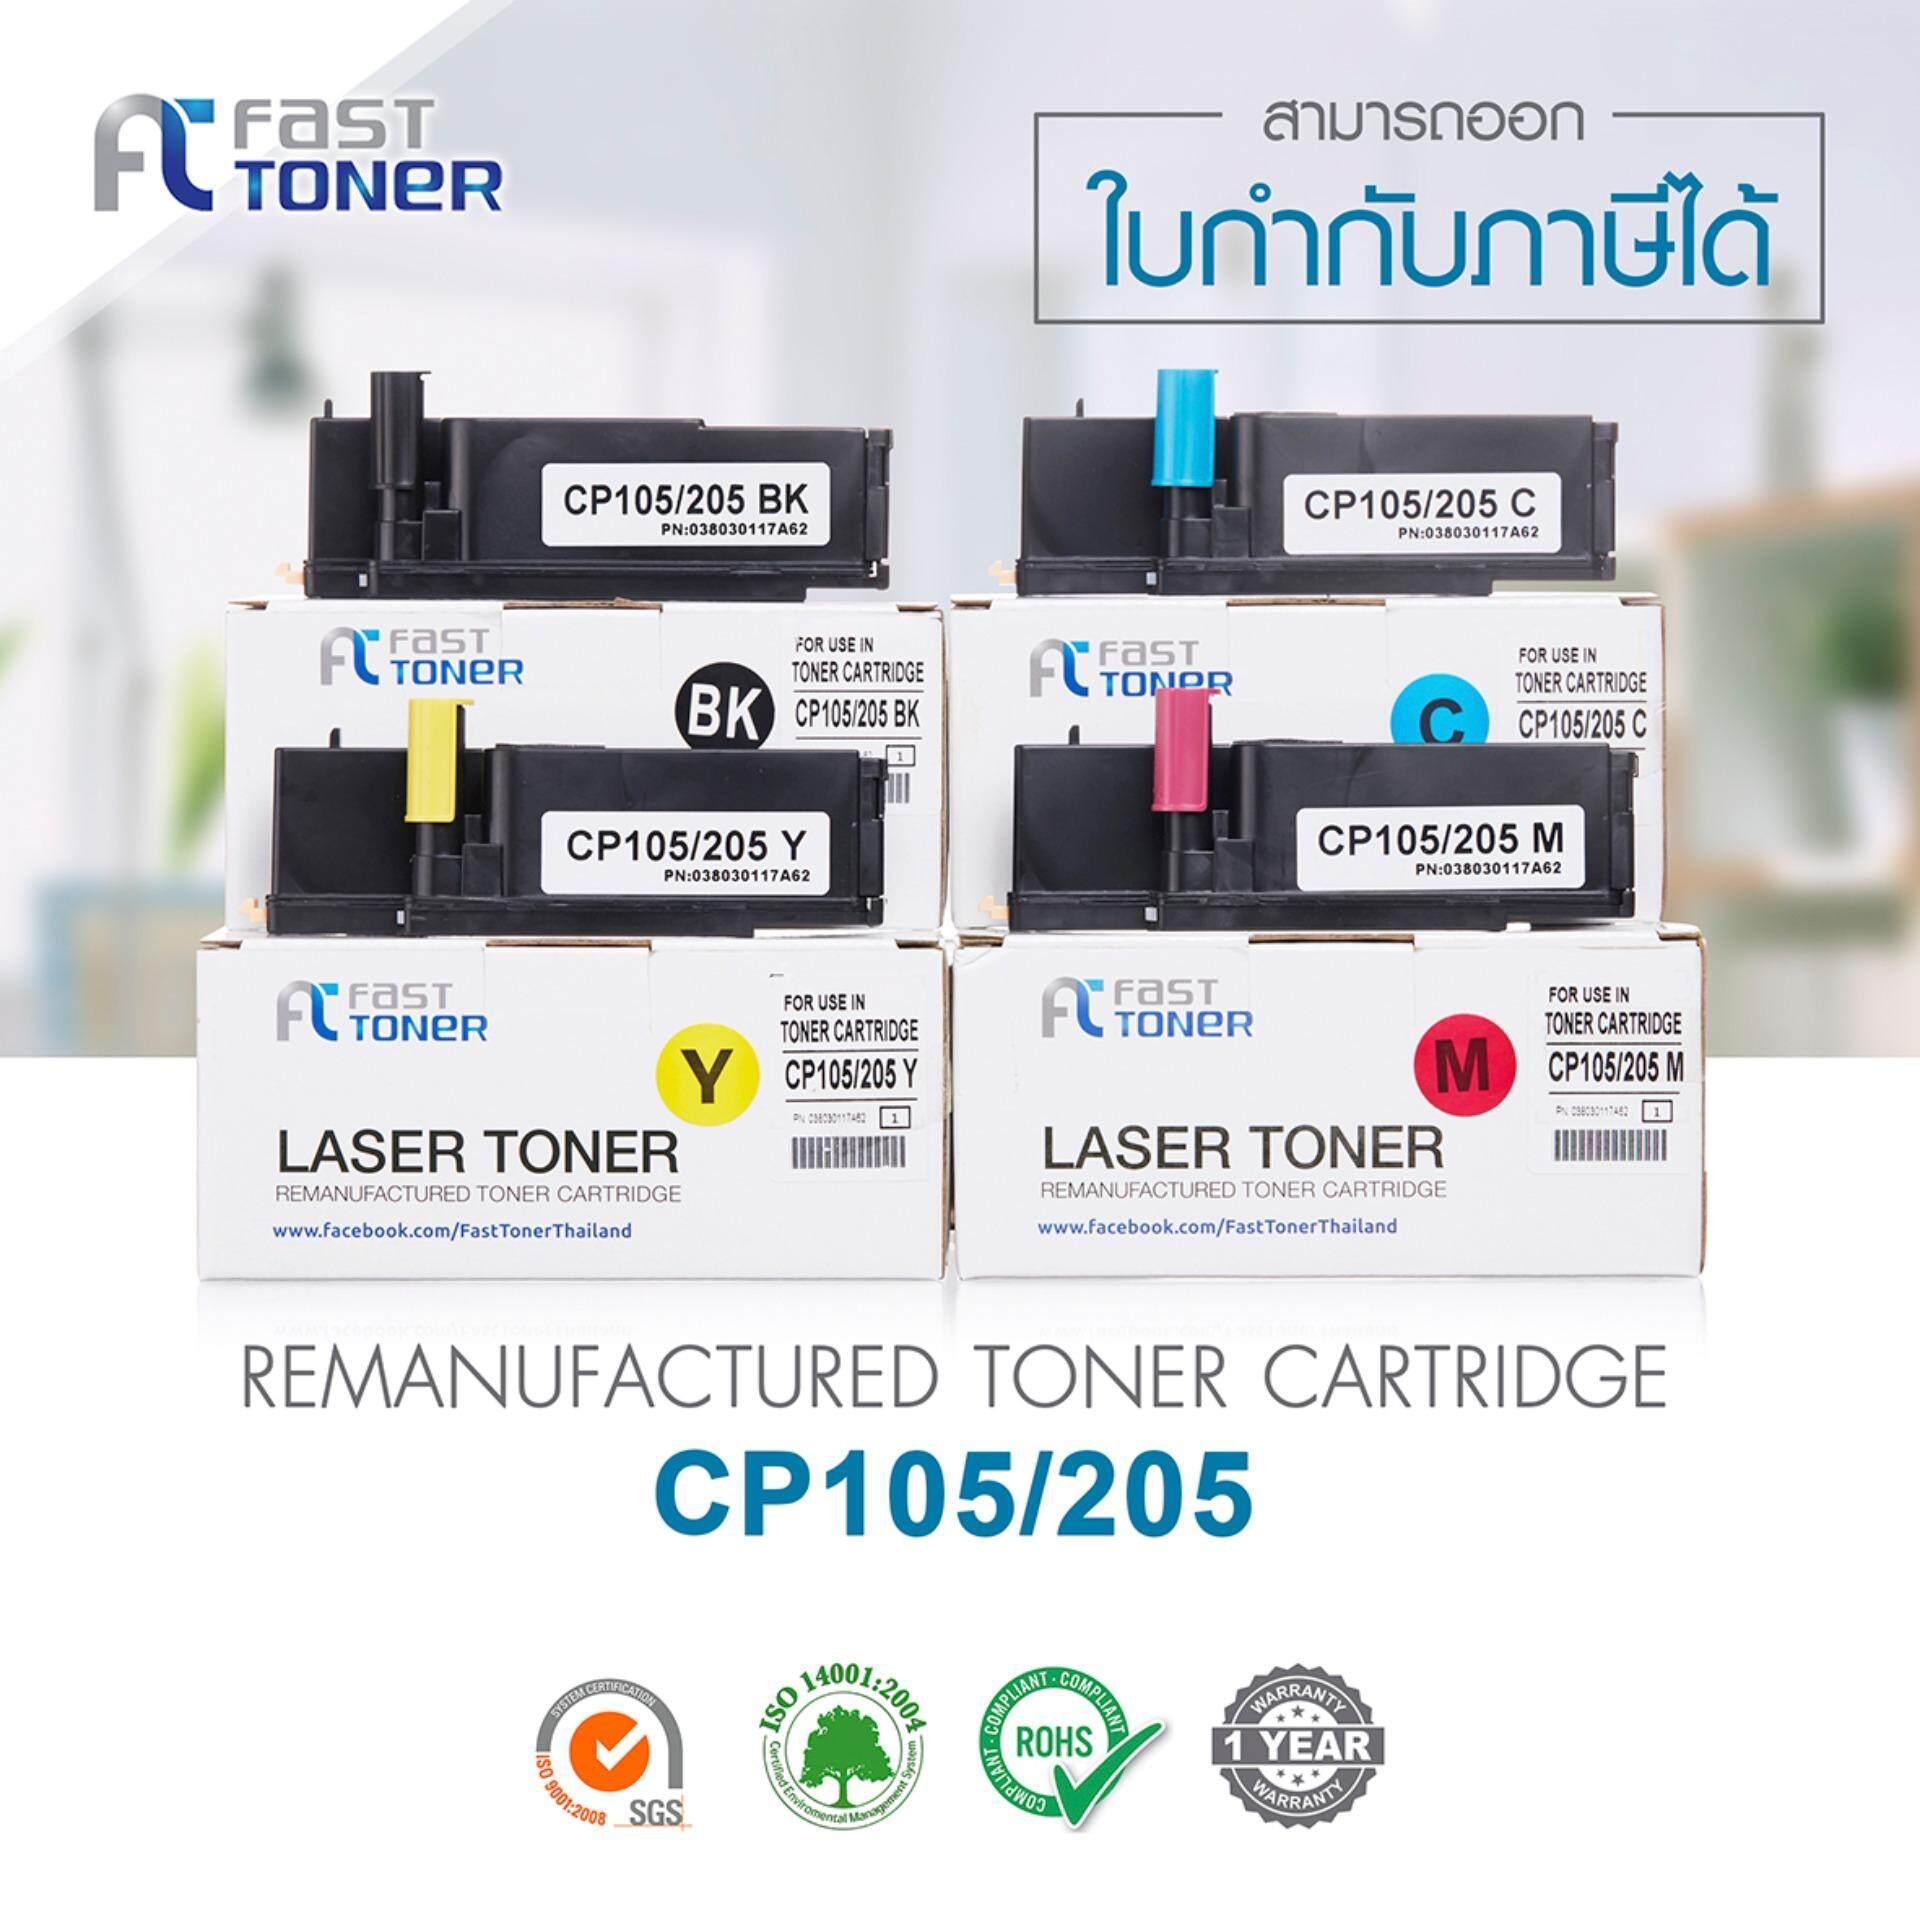 Fast Toner แพ็ค 4 สี Fuji Xerox Toner Docuprint Cp105B Cp205 Cp205W Cm205B Cm205Fw Cp215W Cm215Fw ตลับหมึกเลเซอร์ B C M Y เป็นต้นฉบับ